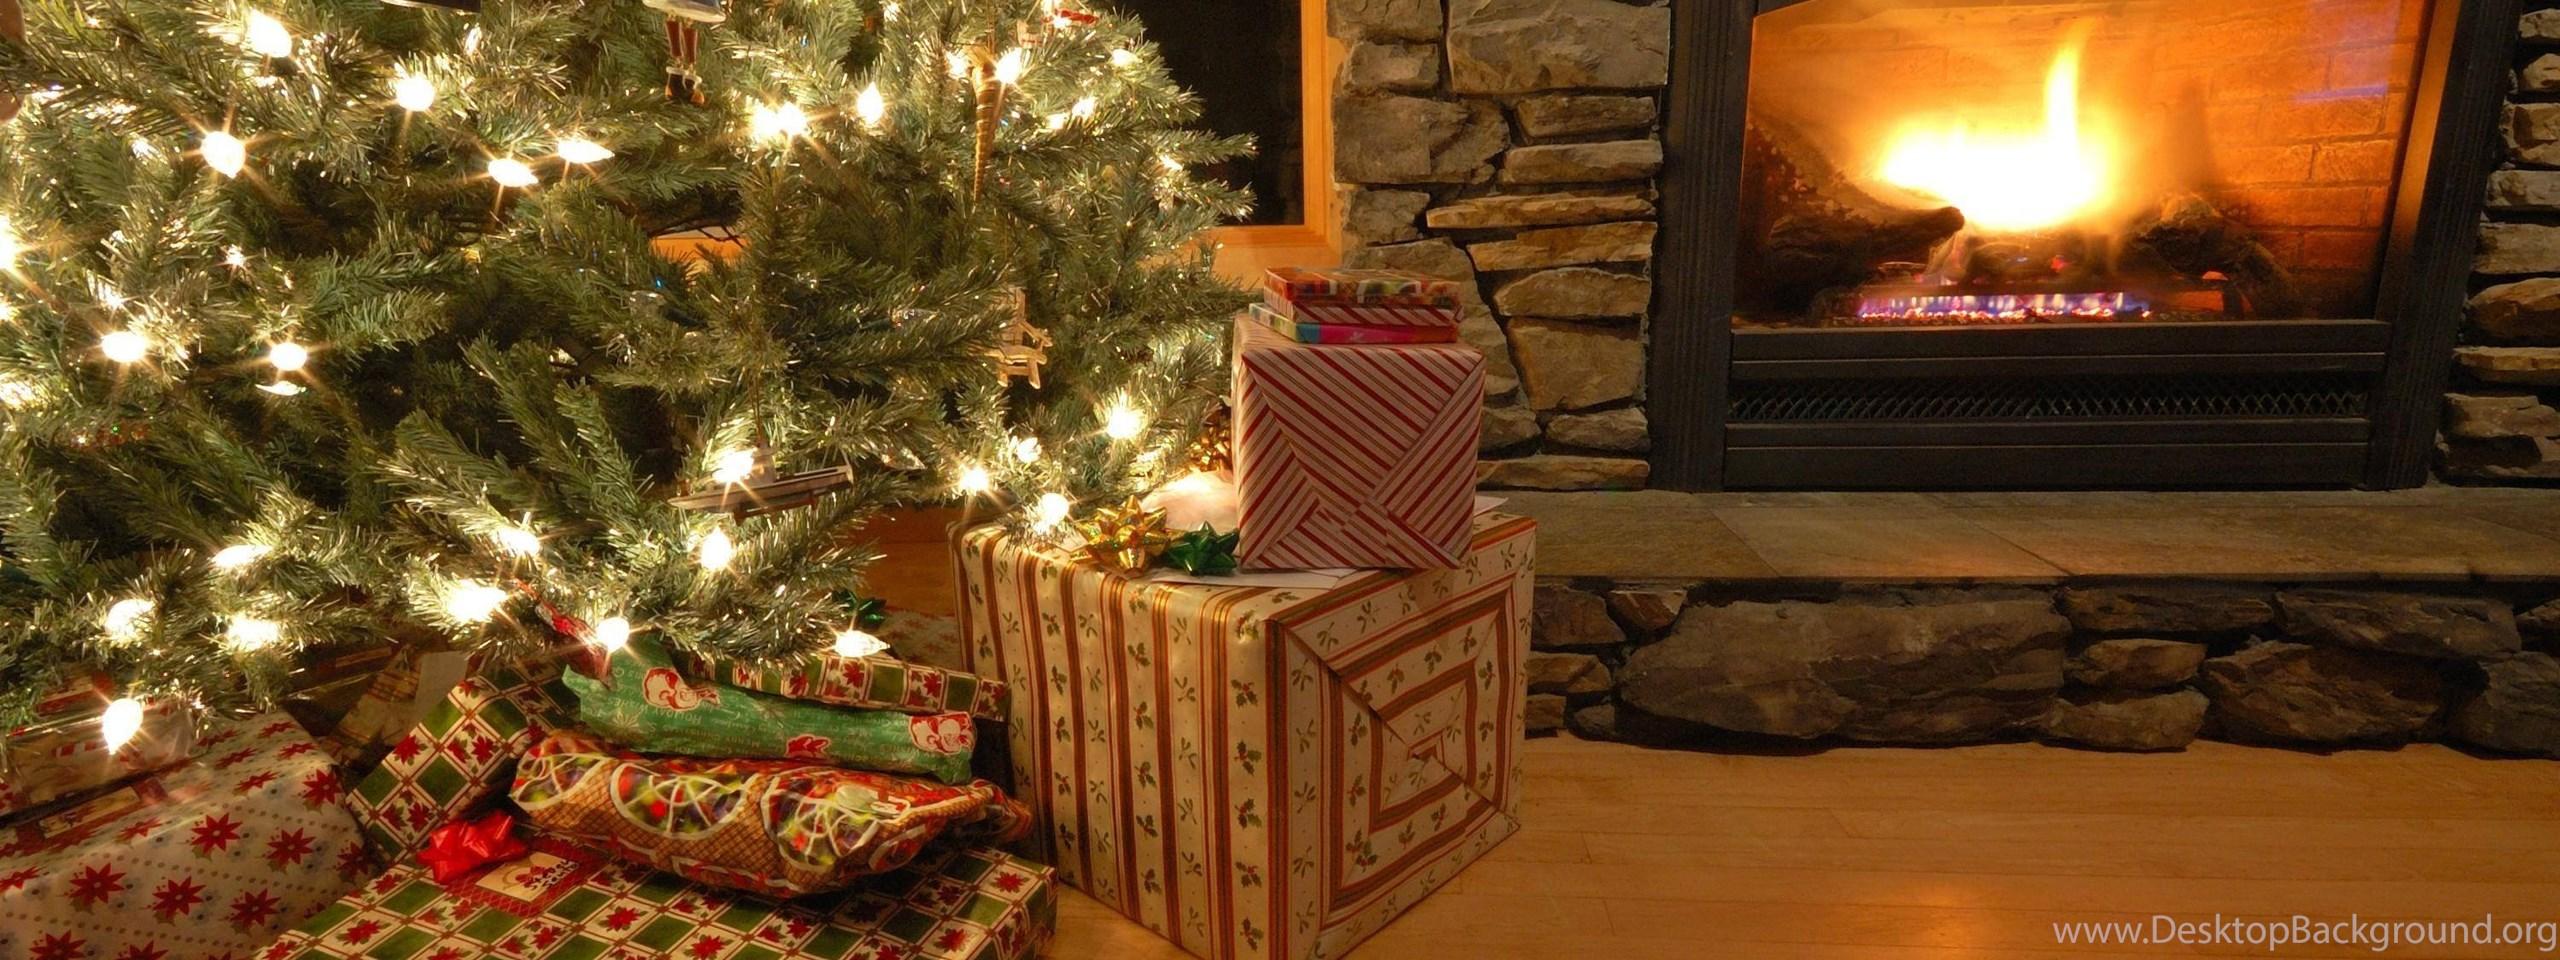 widescreen - Christmas Fireplace Screen